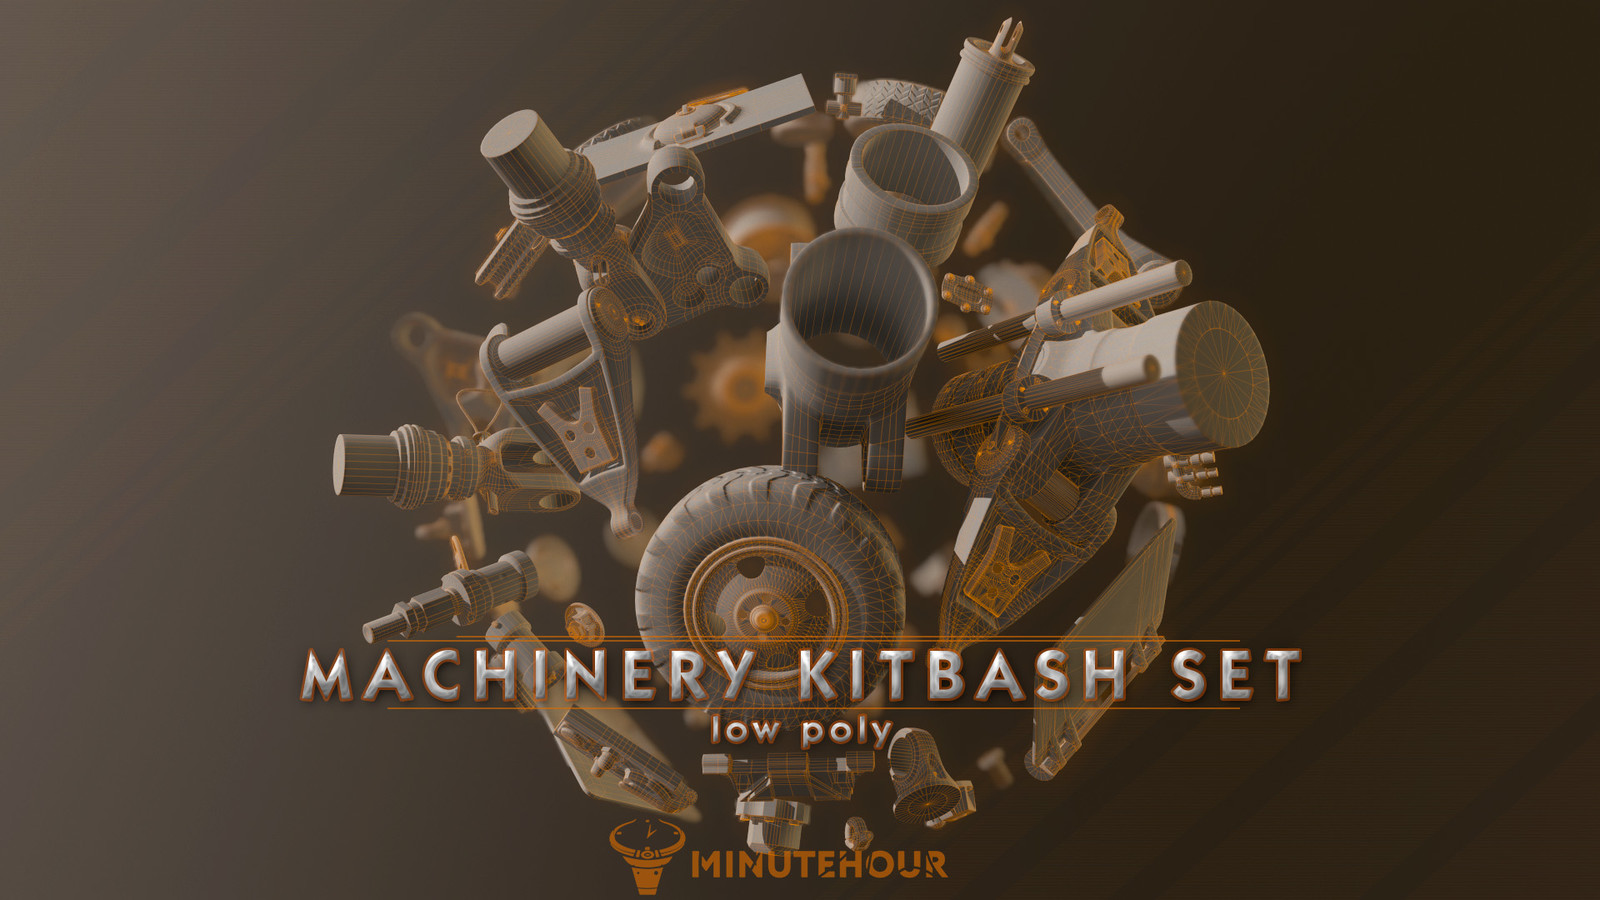 Machinery Kitbash set